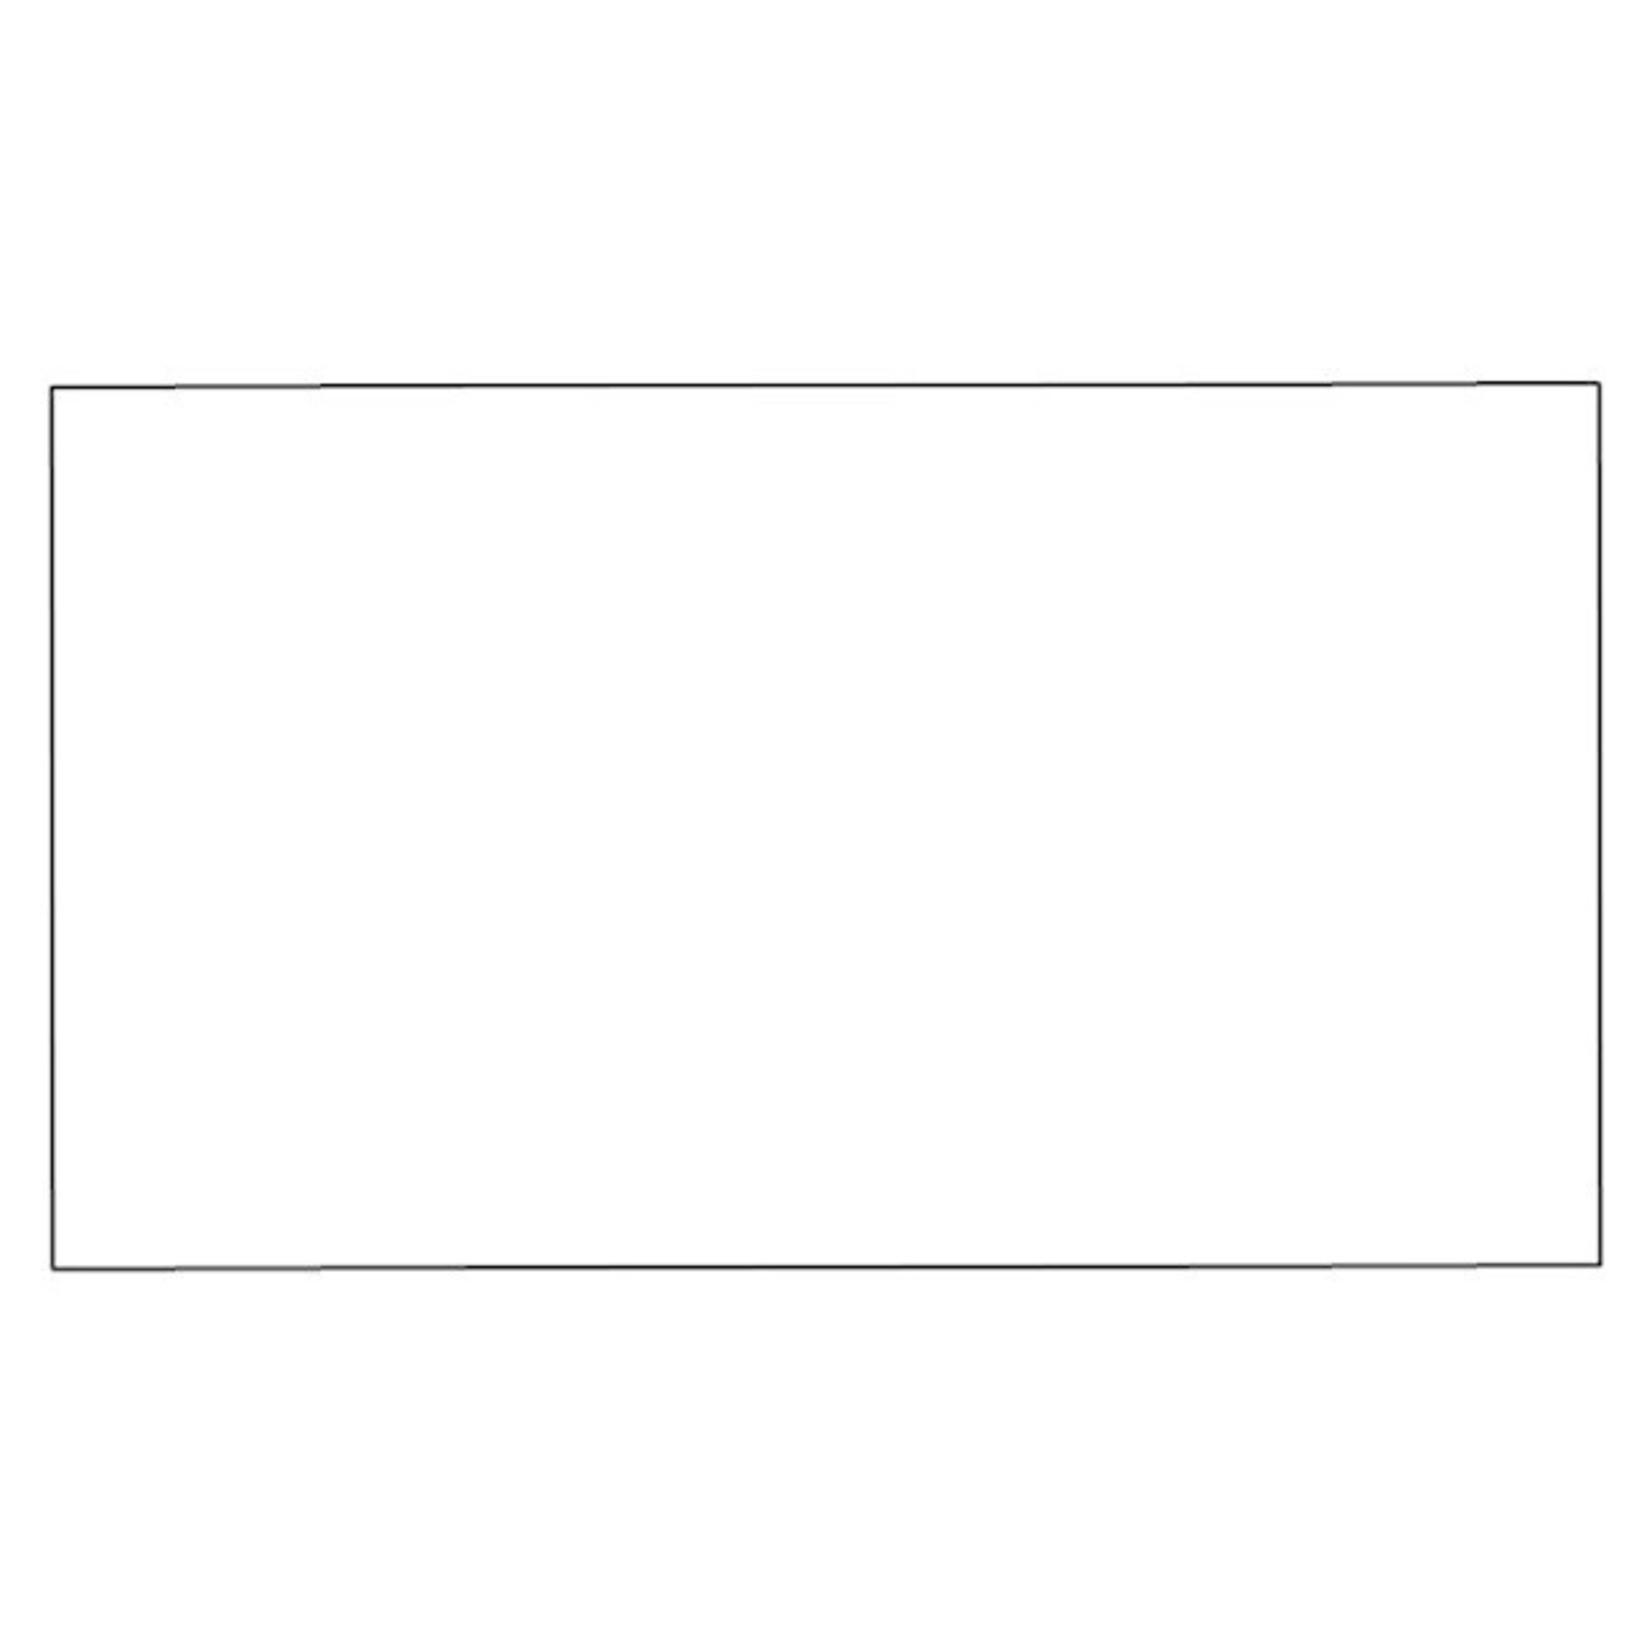 Bad Annie's Business Card (10 Pack) - I Would Definitely Poop Here Again